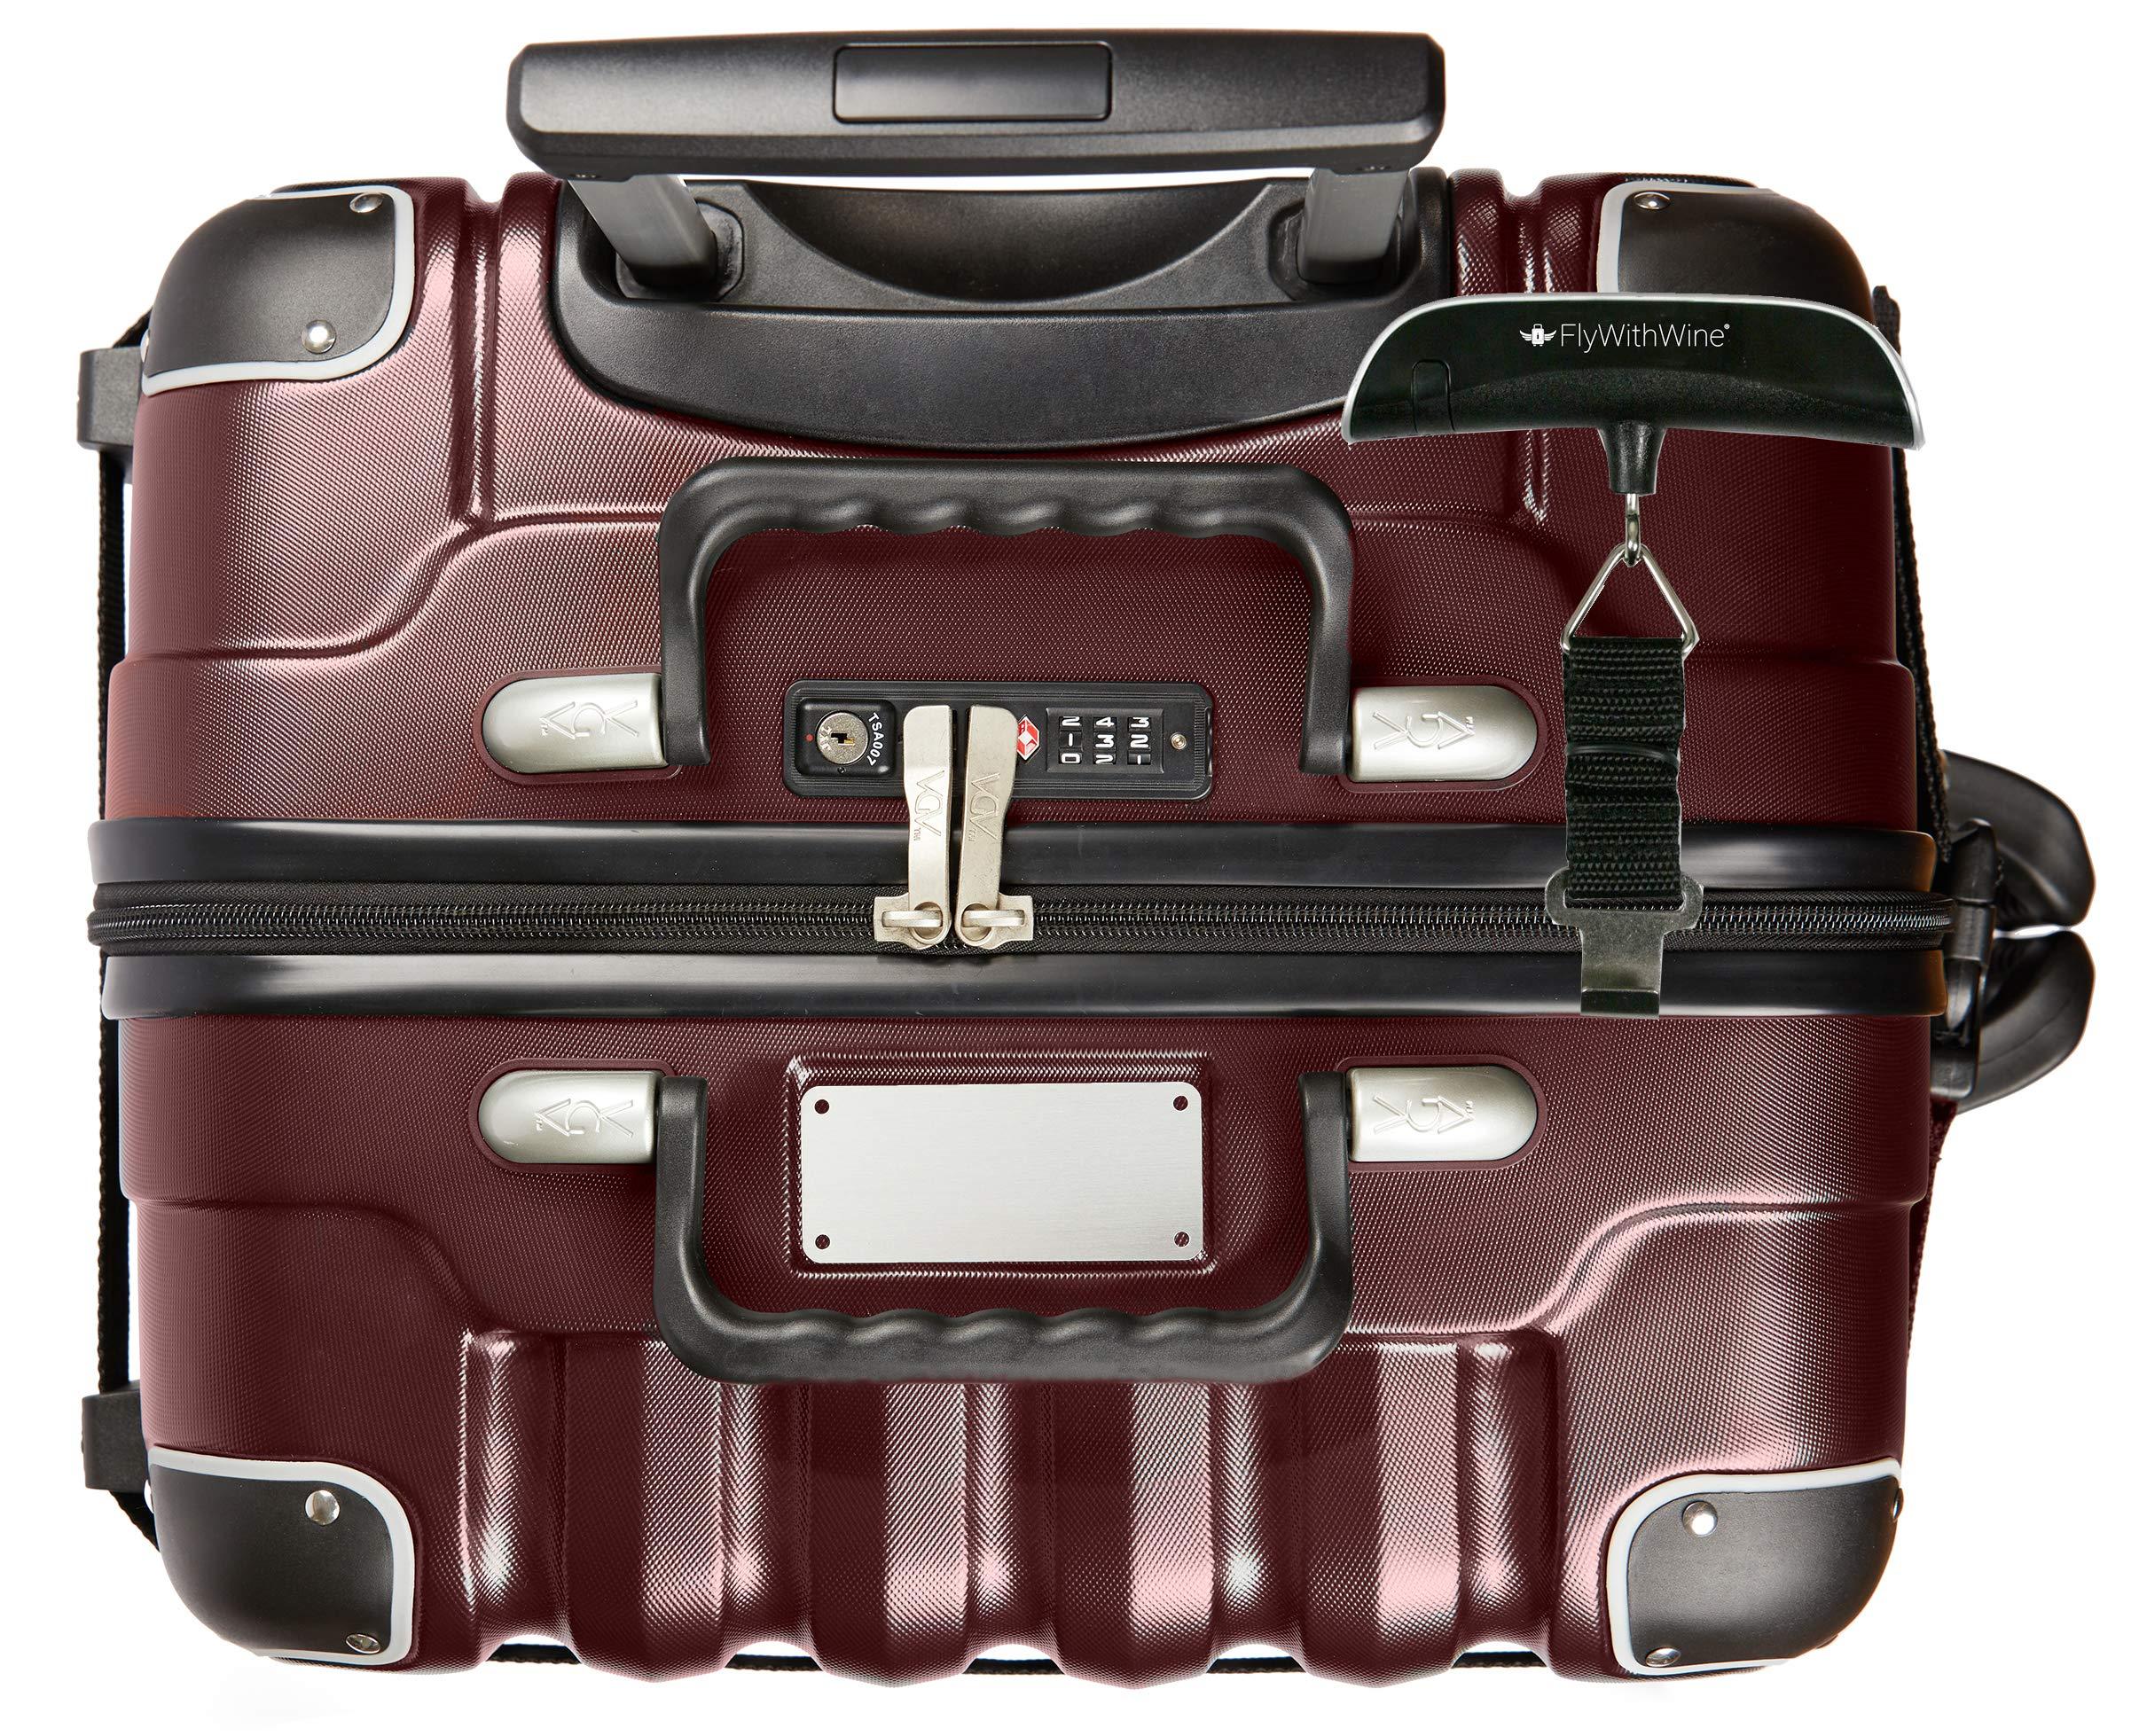 Bundle - 2 items: VinGardeValise 12 Bottle Wine Travel Suitcase with Personalizable nameplate, FlyWithWine Digital Luggage Scale - Burgundy by VinGardeValise